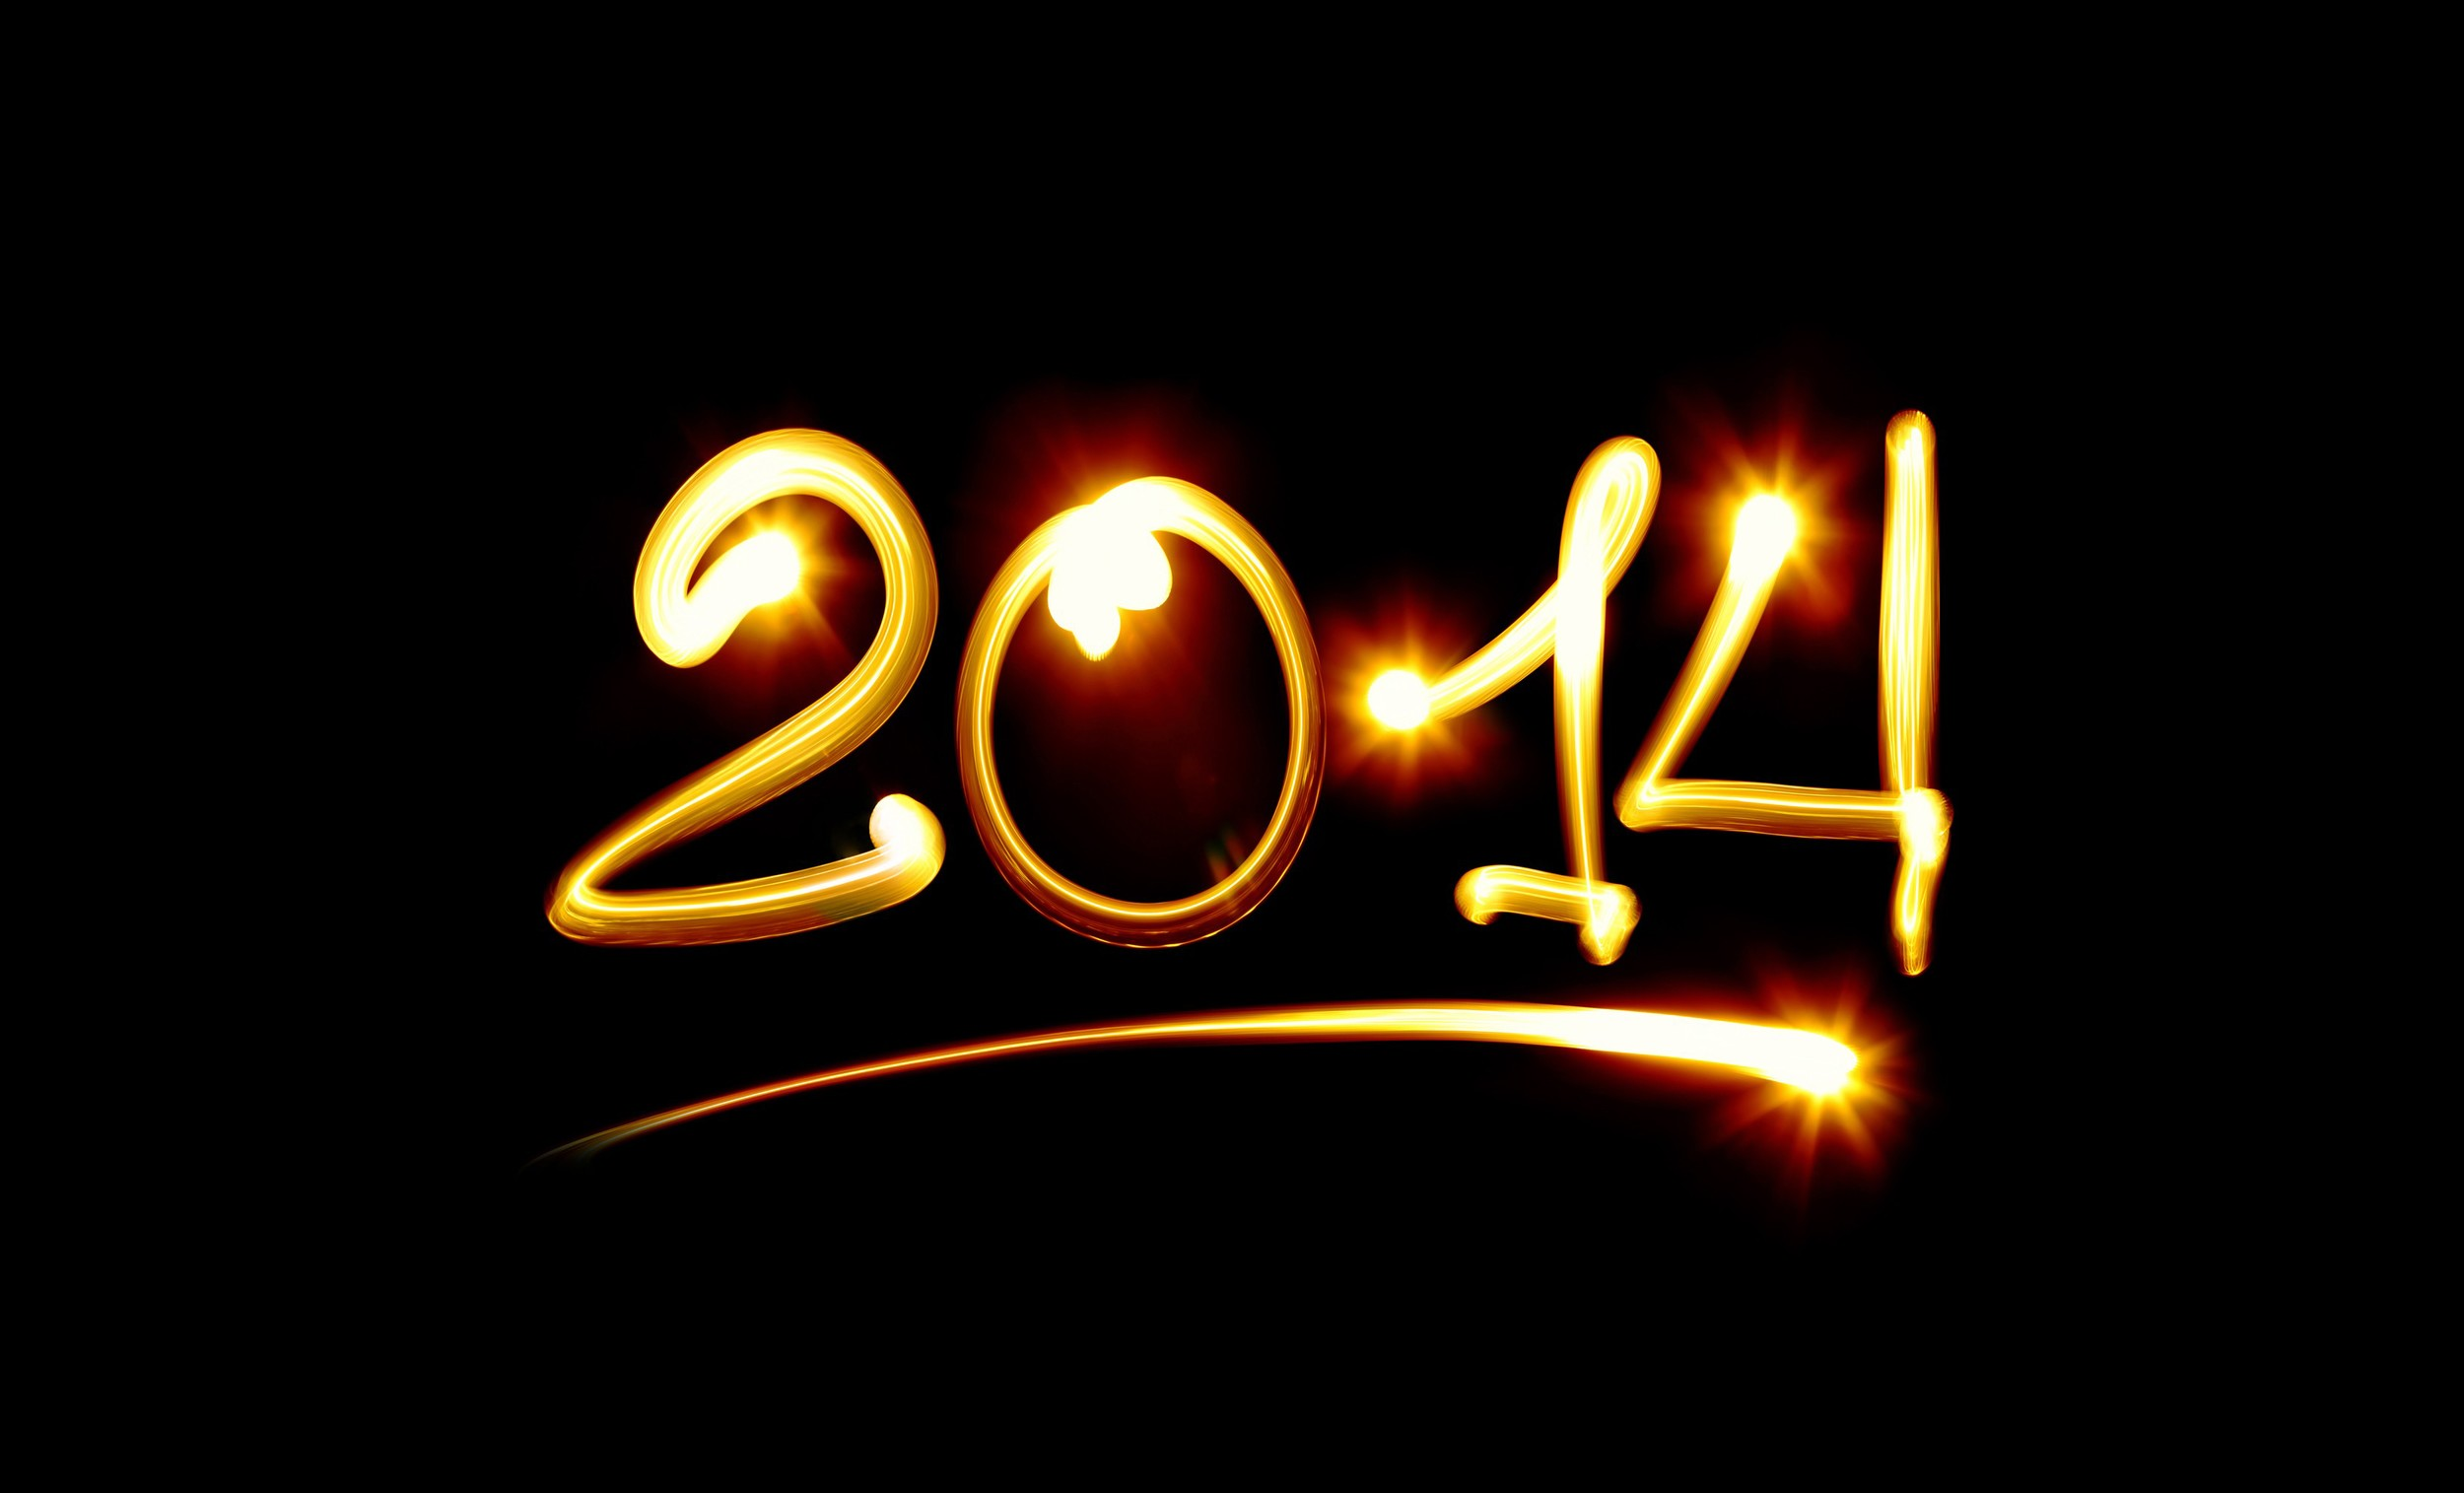 2014-New-Year-3D-Fireworks-Art-HD-Wallpaper.jpg